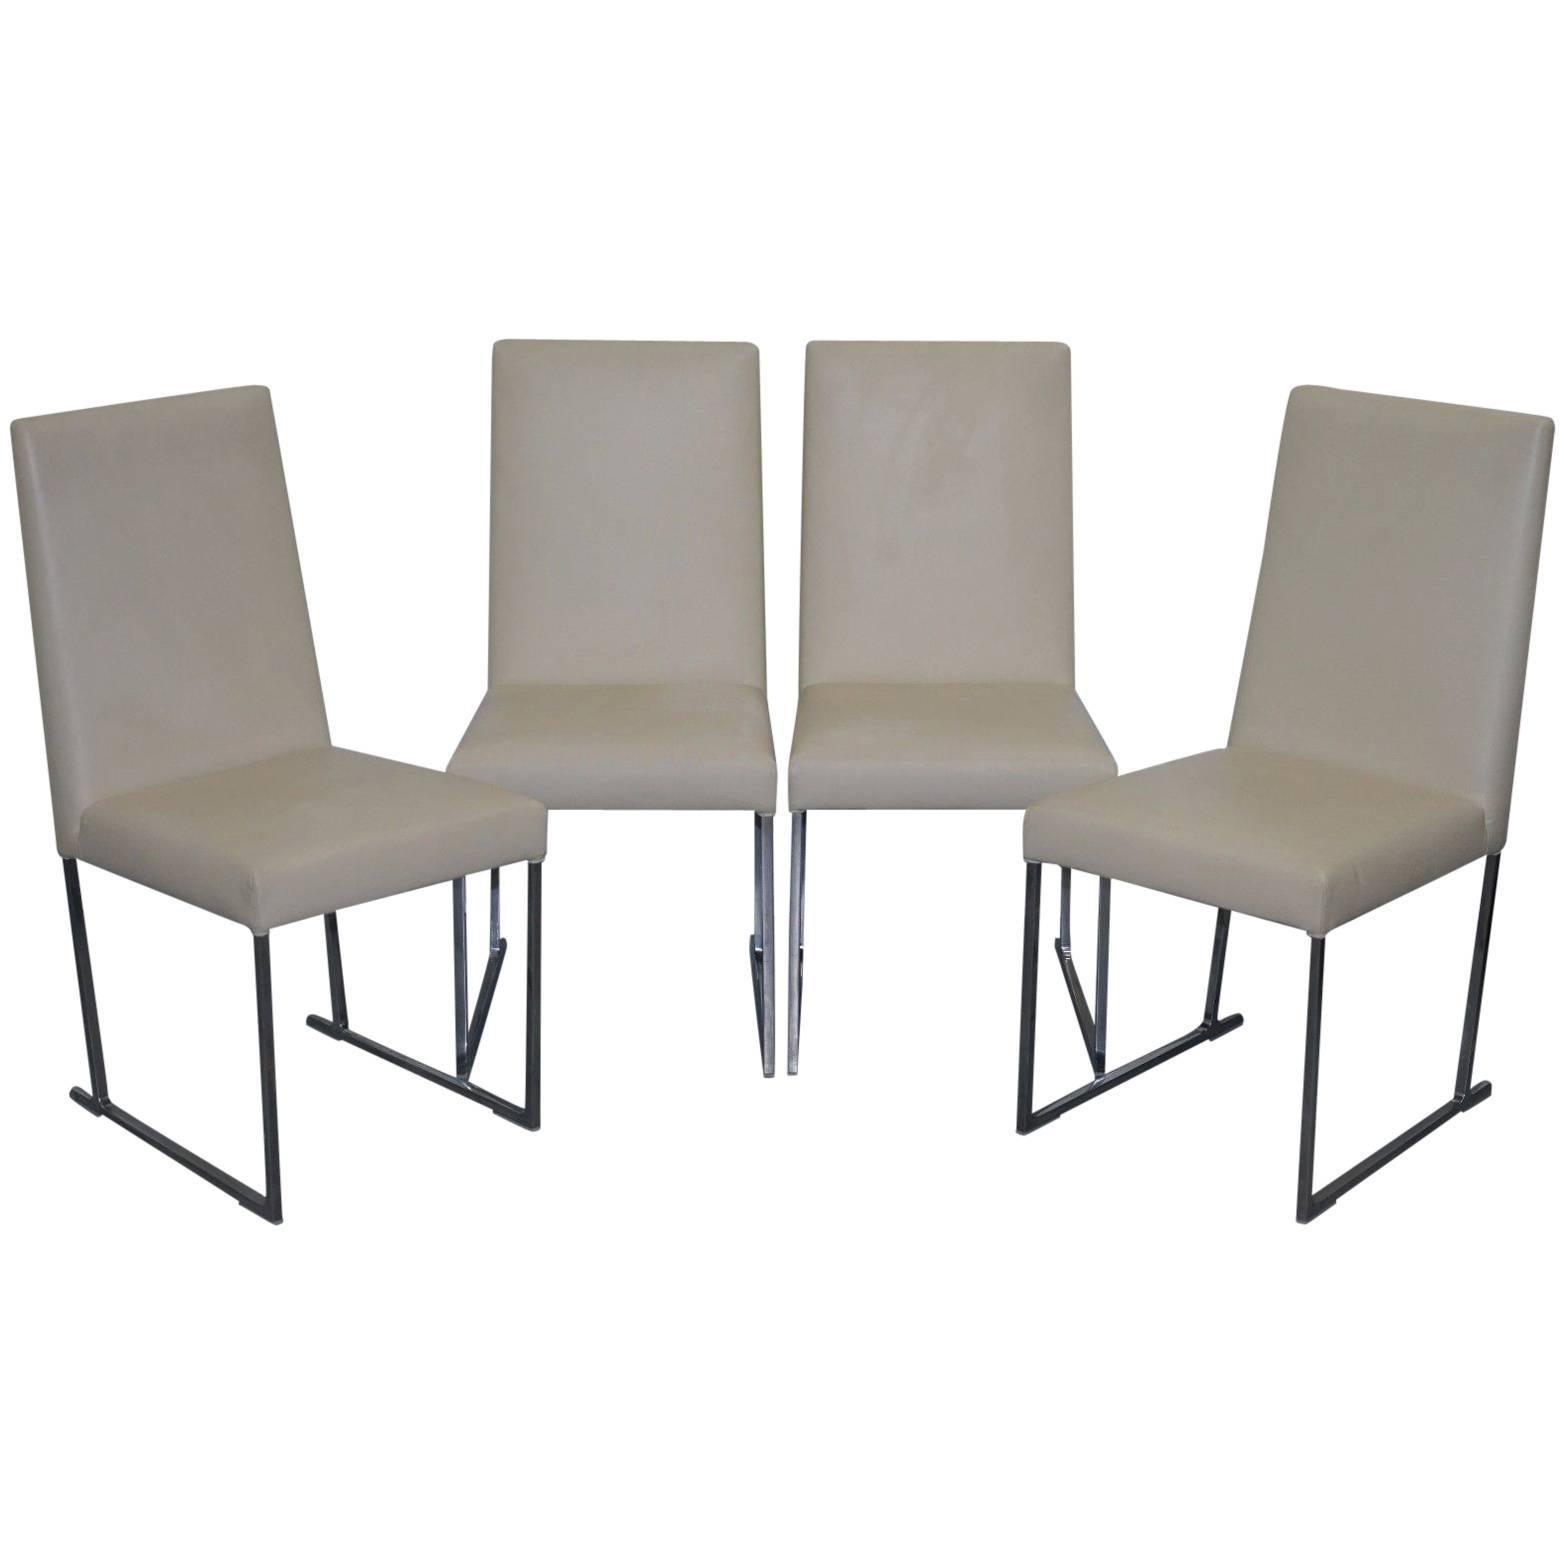 Four Antonio Citterio Bu0026B Italia S47 Solo Dining Chairs Cream Leather For  Sale